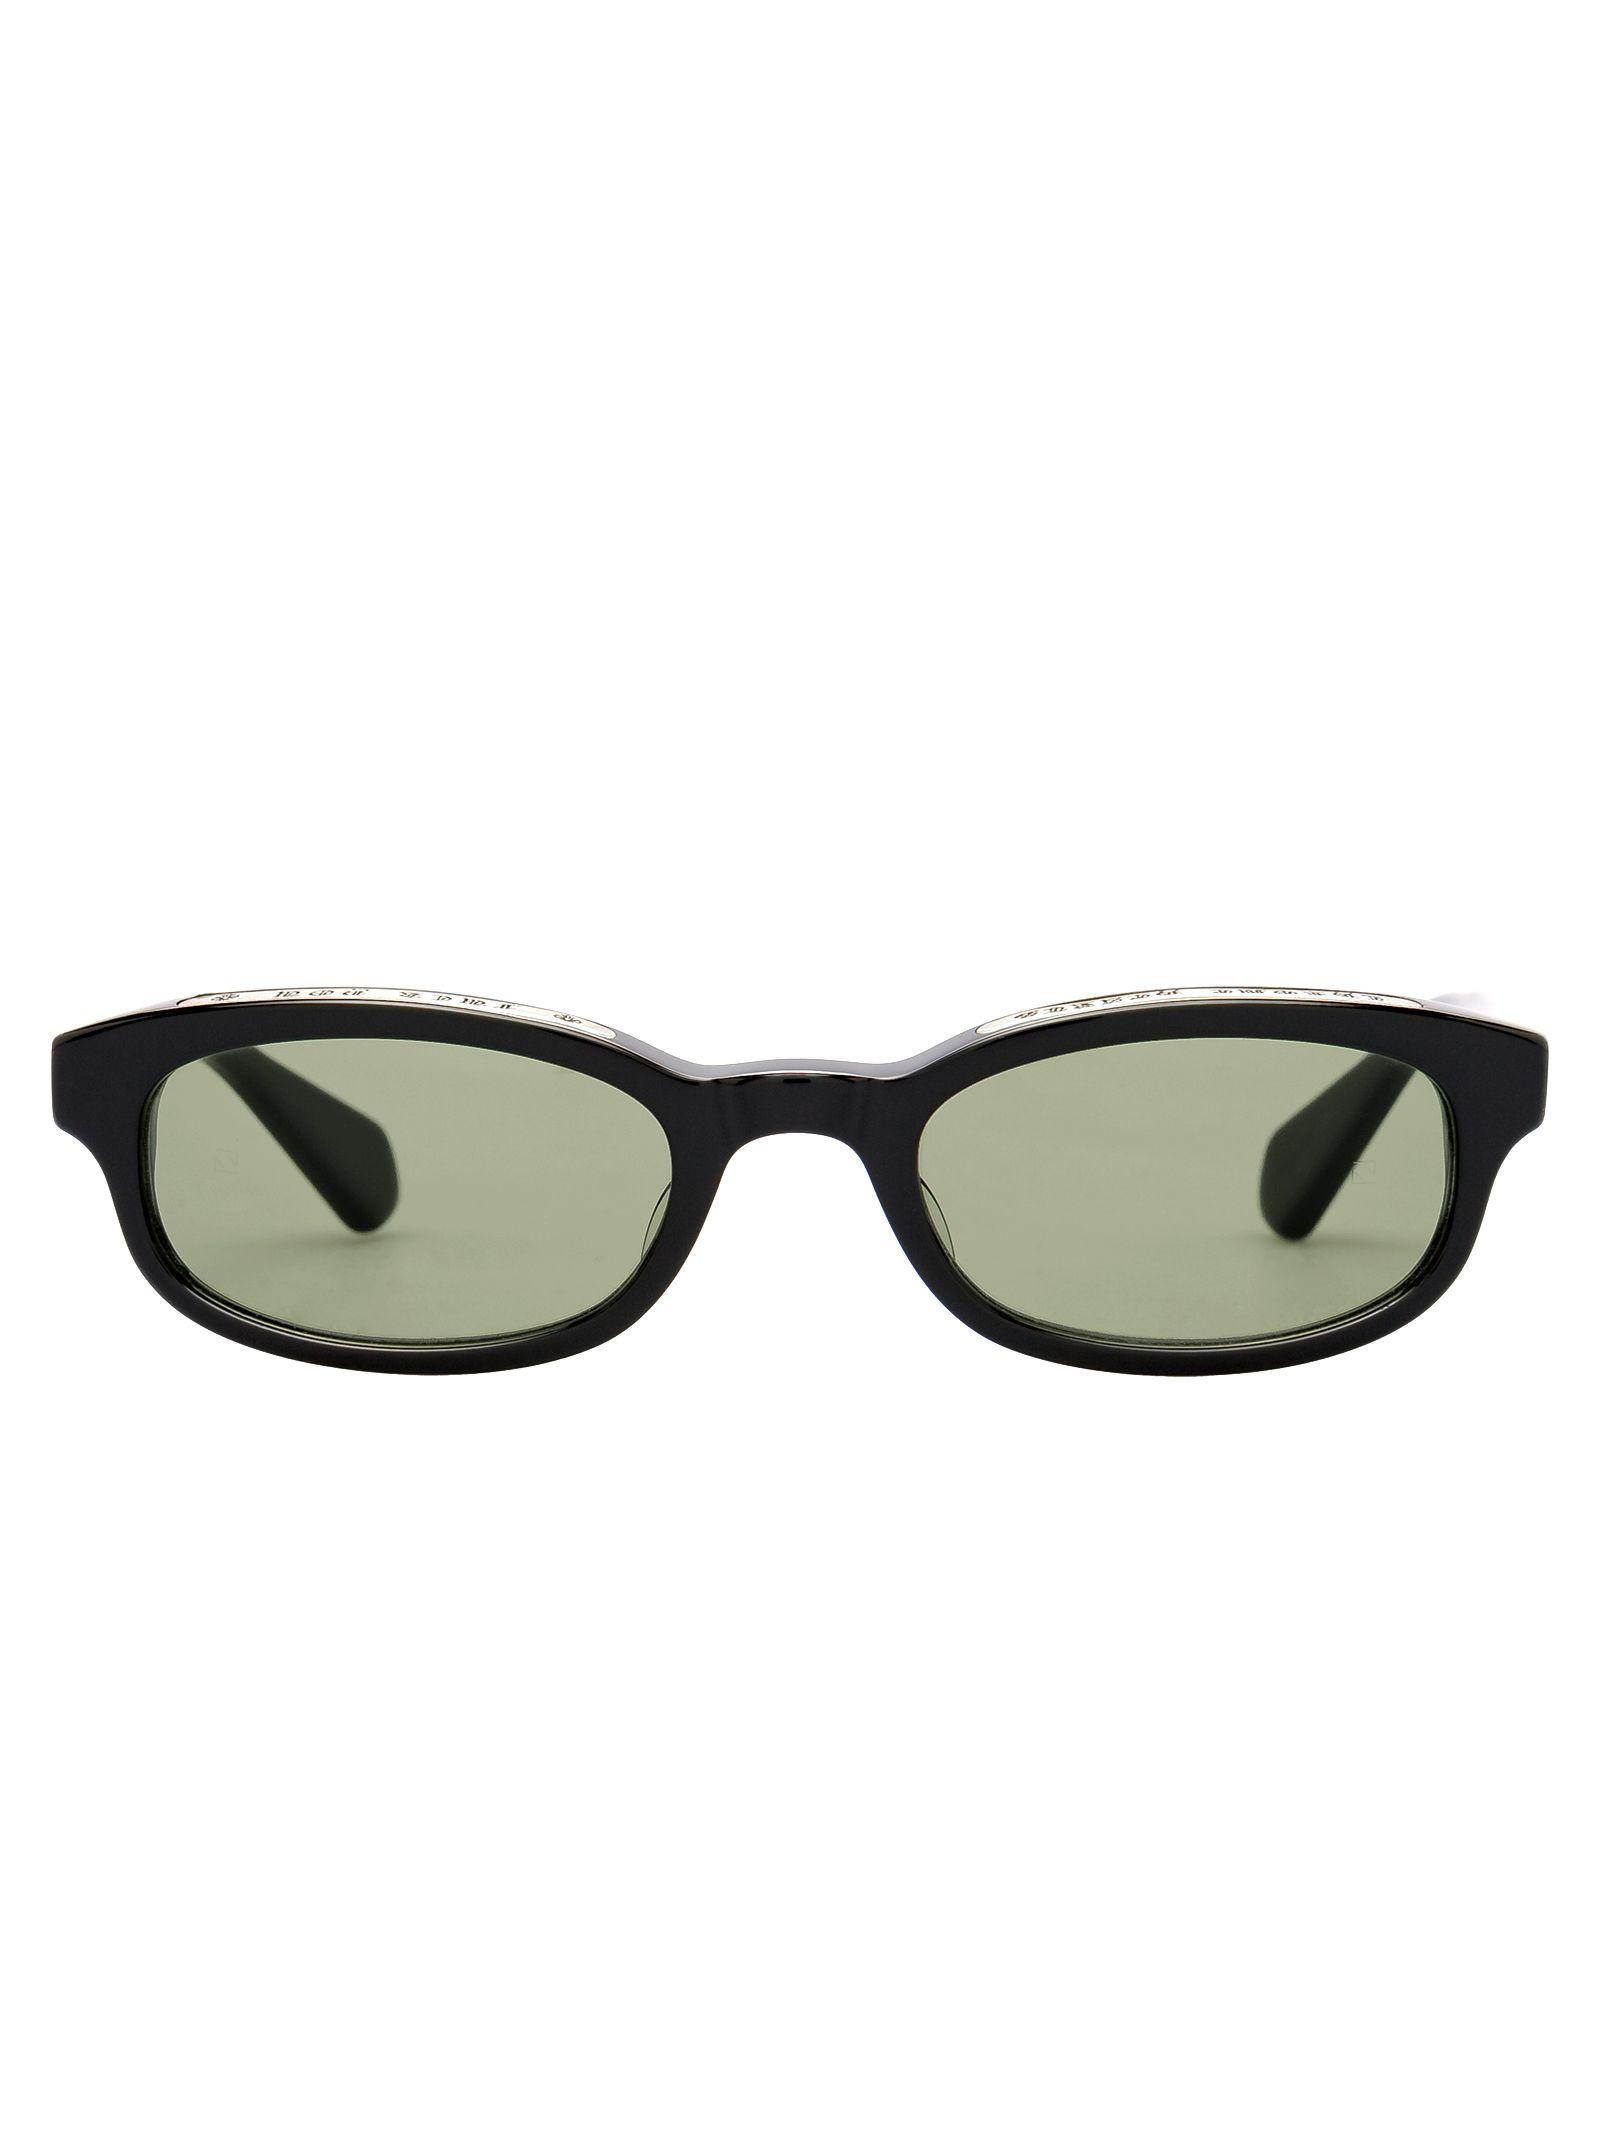 CHROME HEARTS Lowrider Sunglasses in Bk/Pg